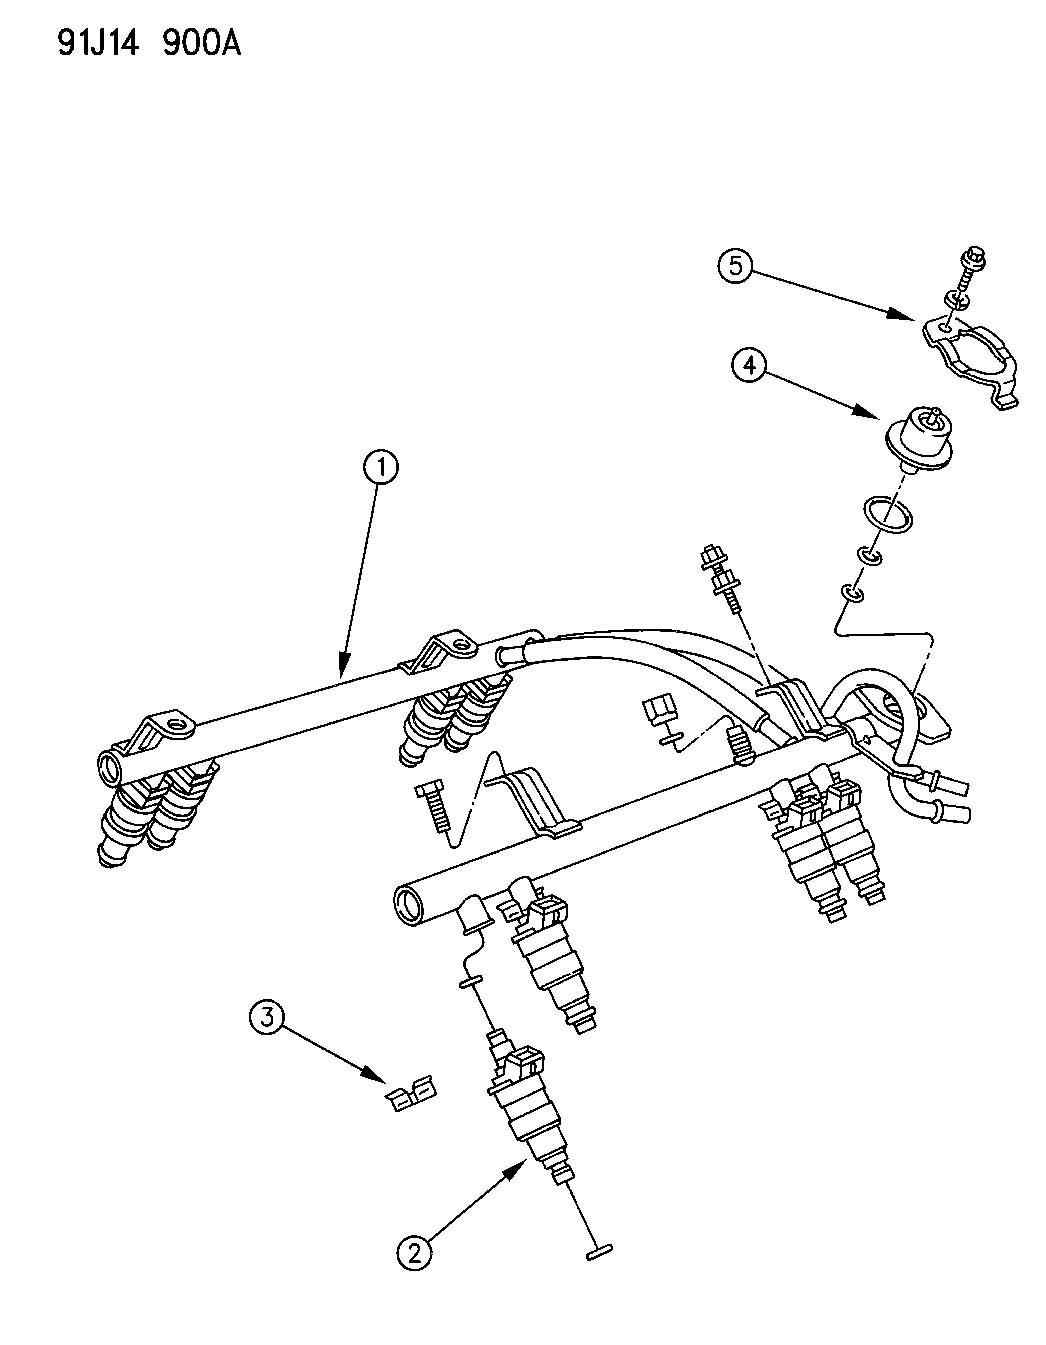 jeep yj fuel filter skid plate